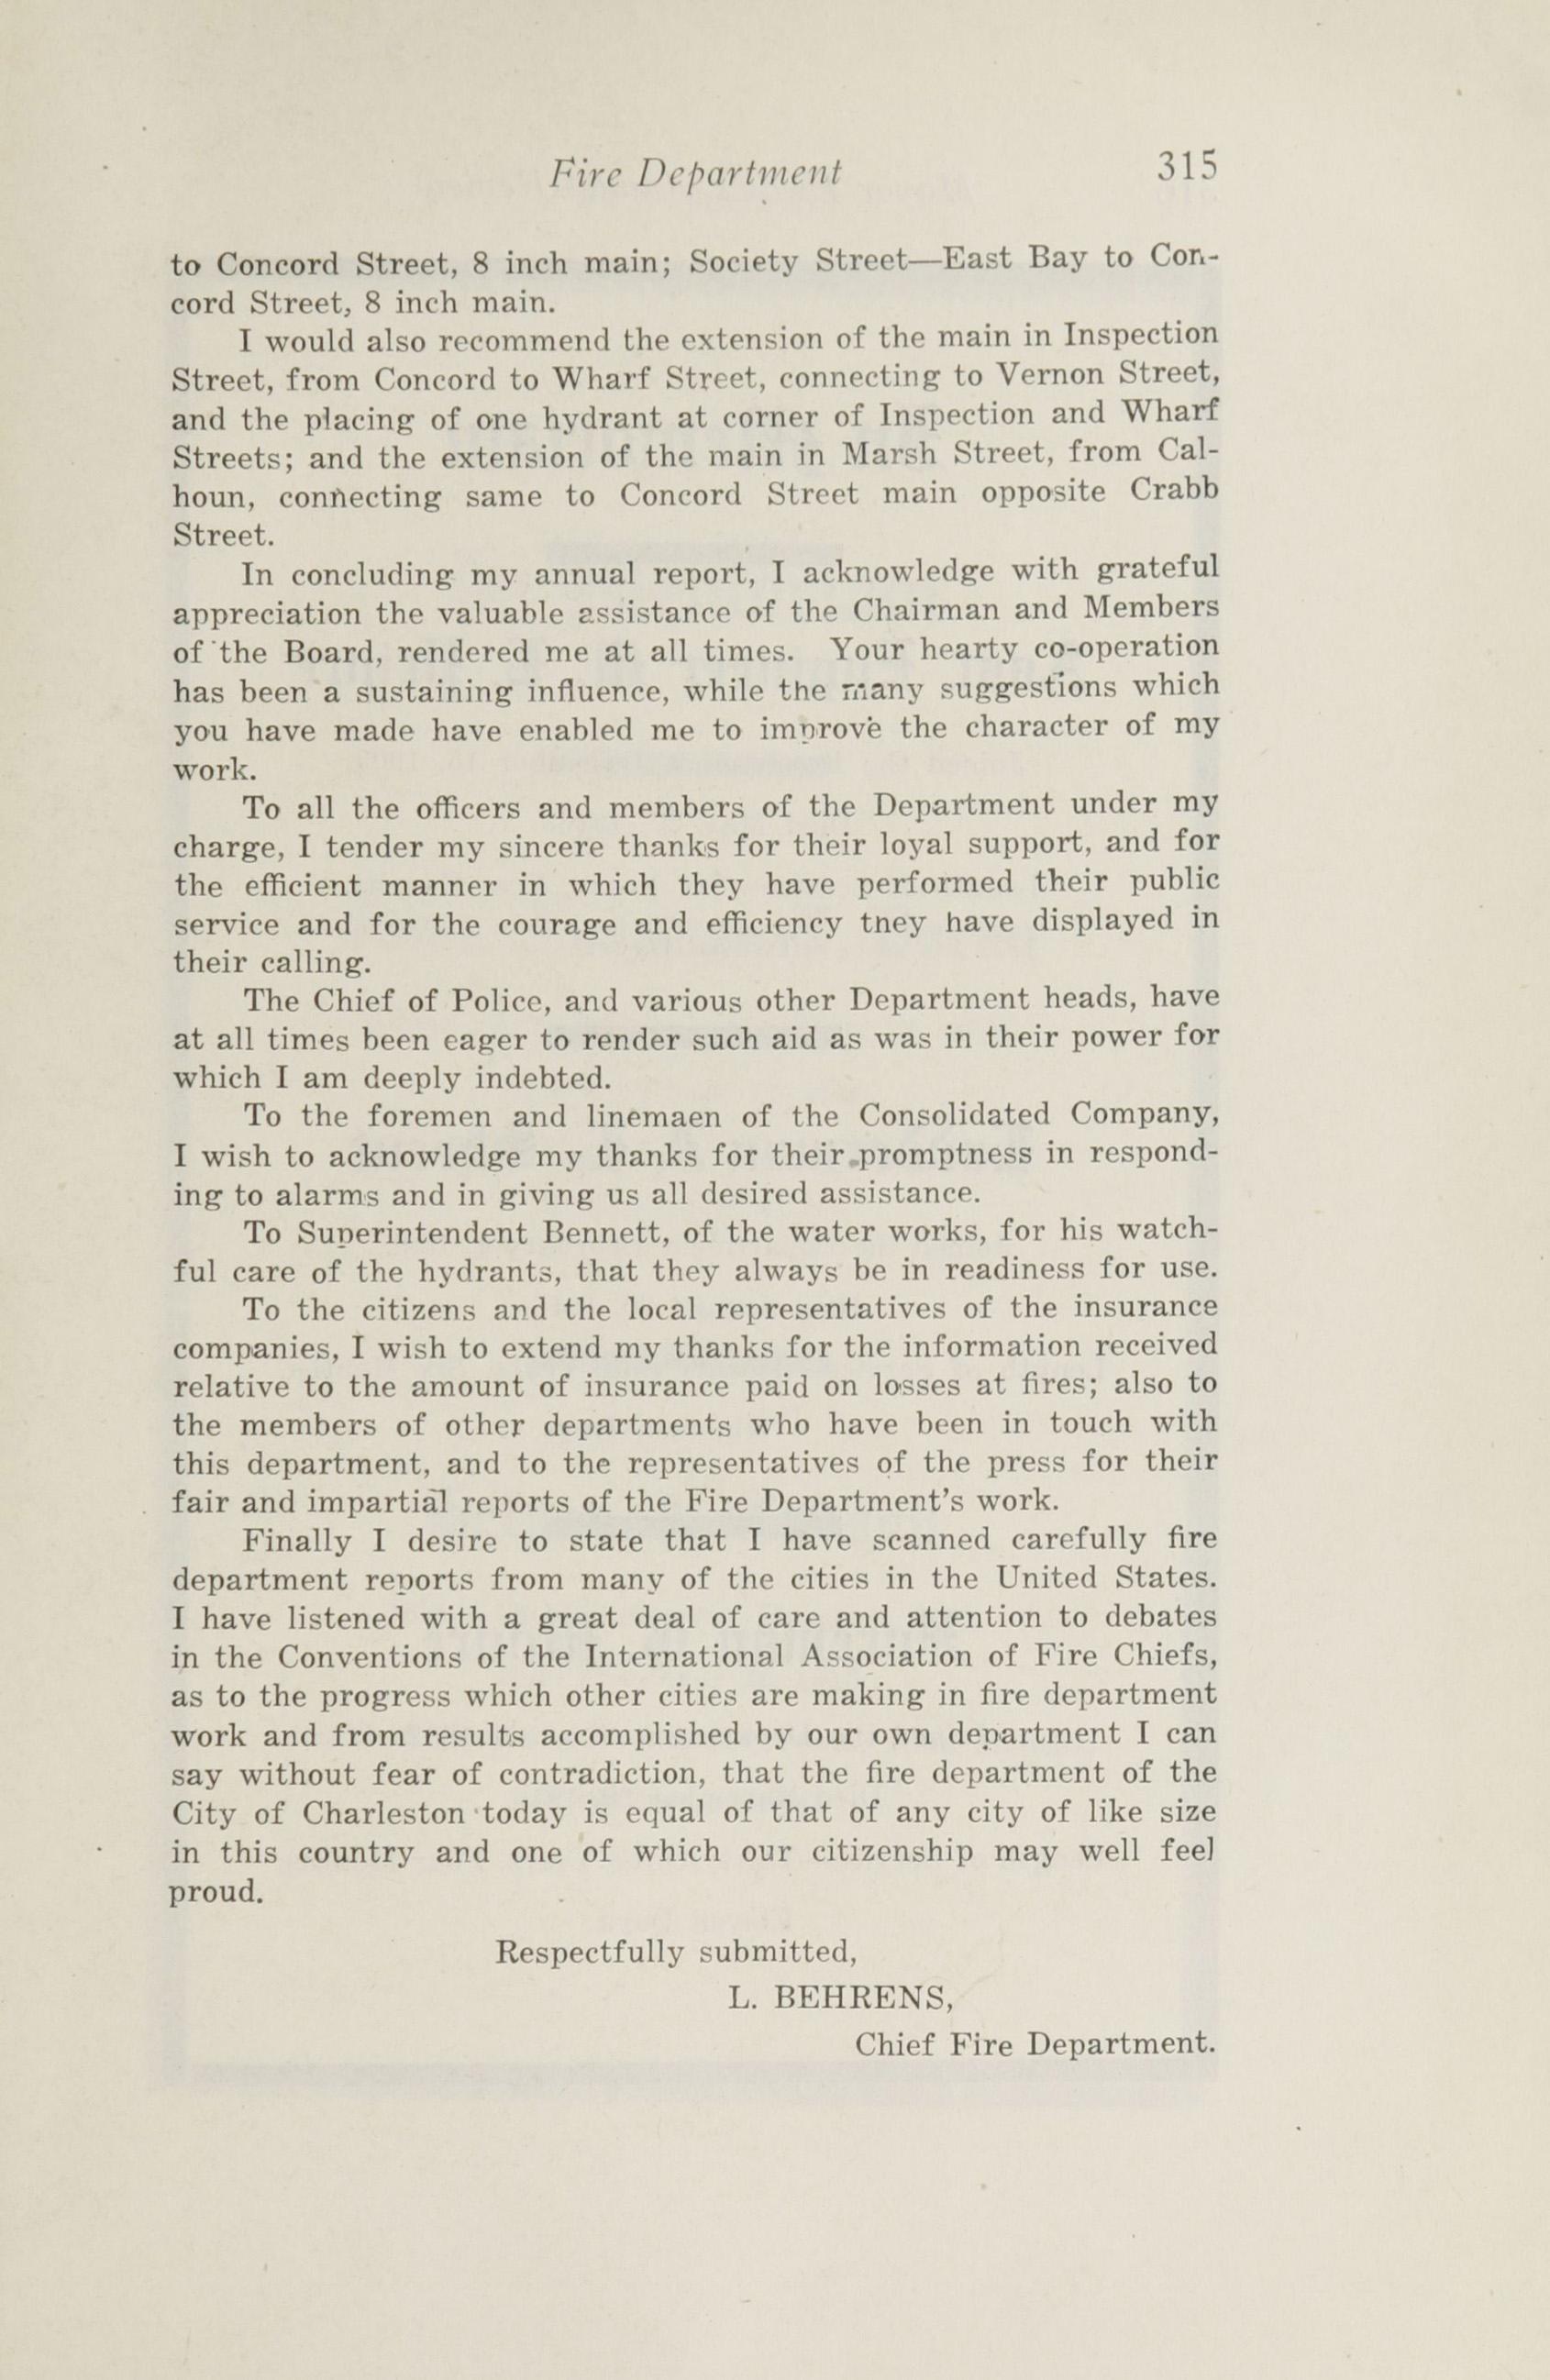 Charleston Yearbook, 1916, page 315